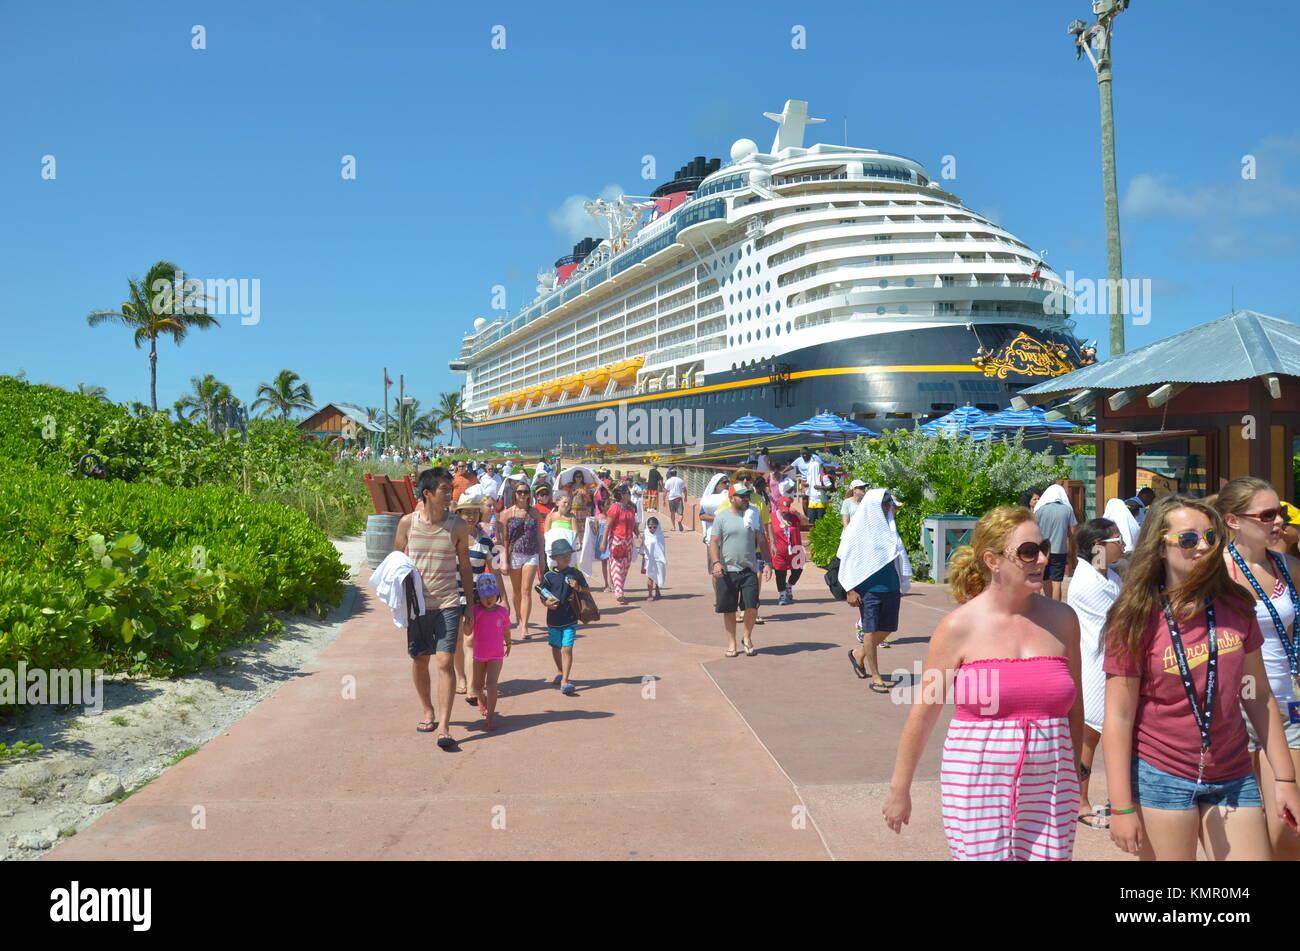 Disney S Castaway Cay Private Island In The Bahamas Stock Photo Alamy